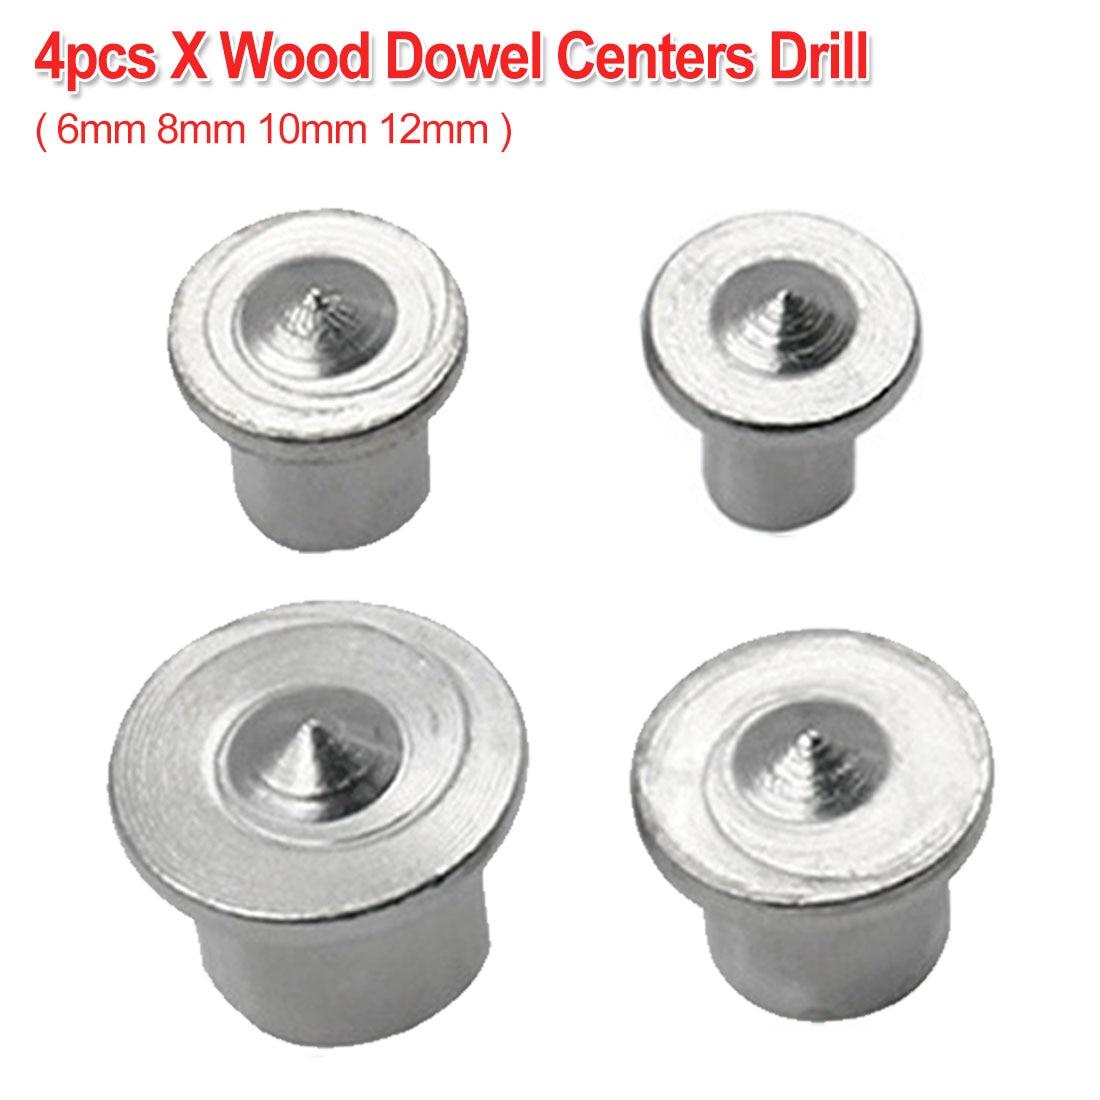 4pcs Dowel Centre Point Pin Set 6mm 8mm 10mm 12mm Dowel Tenon Center Set Woodworking Tool Transfer Plug Wood Drill Power Tool